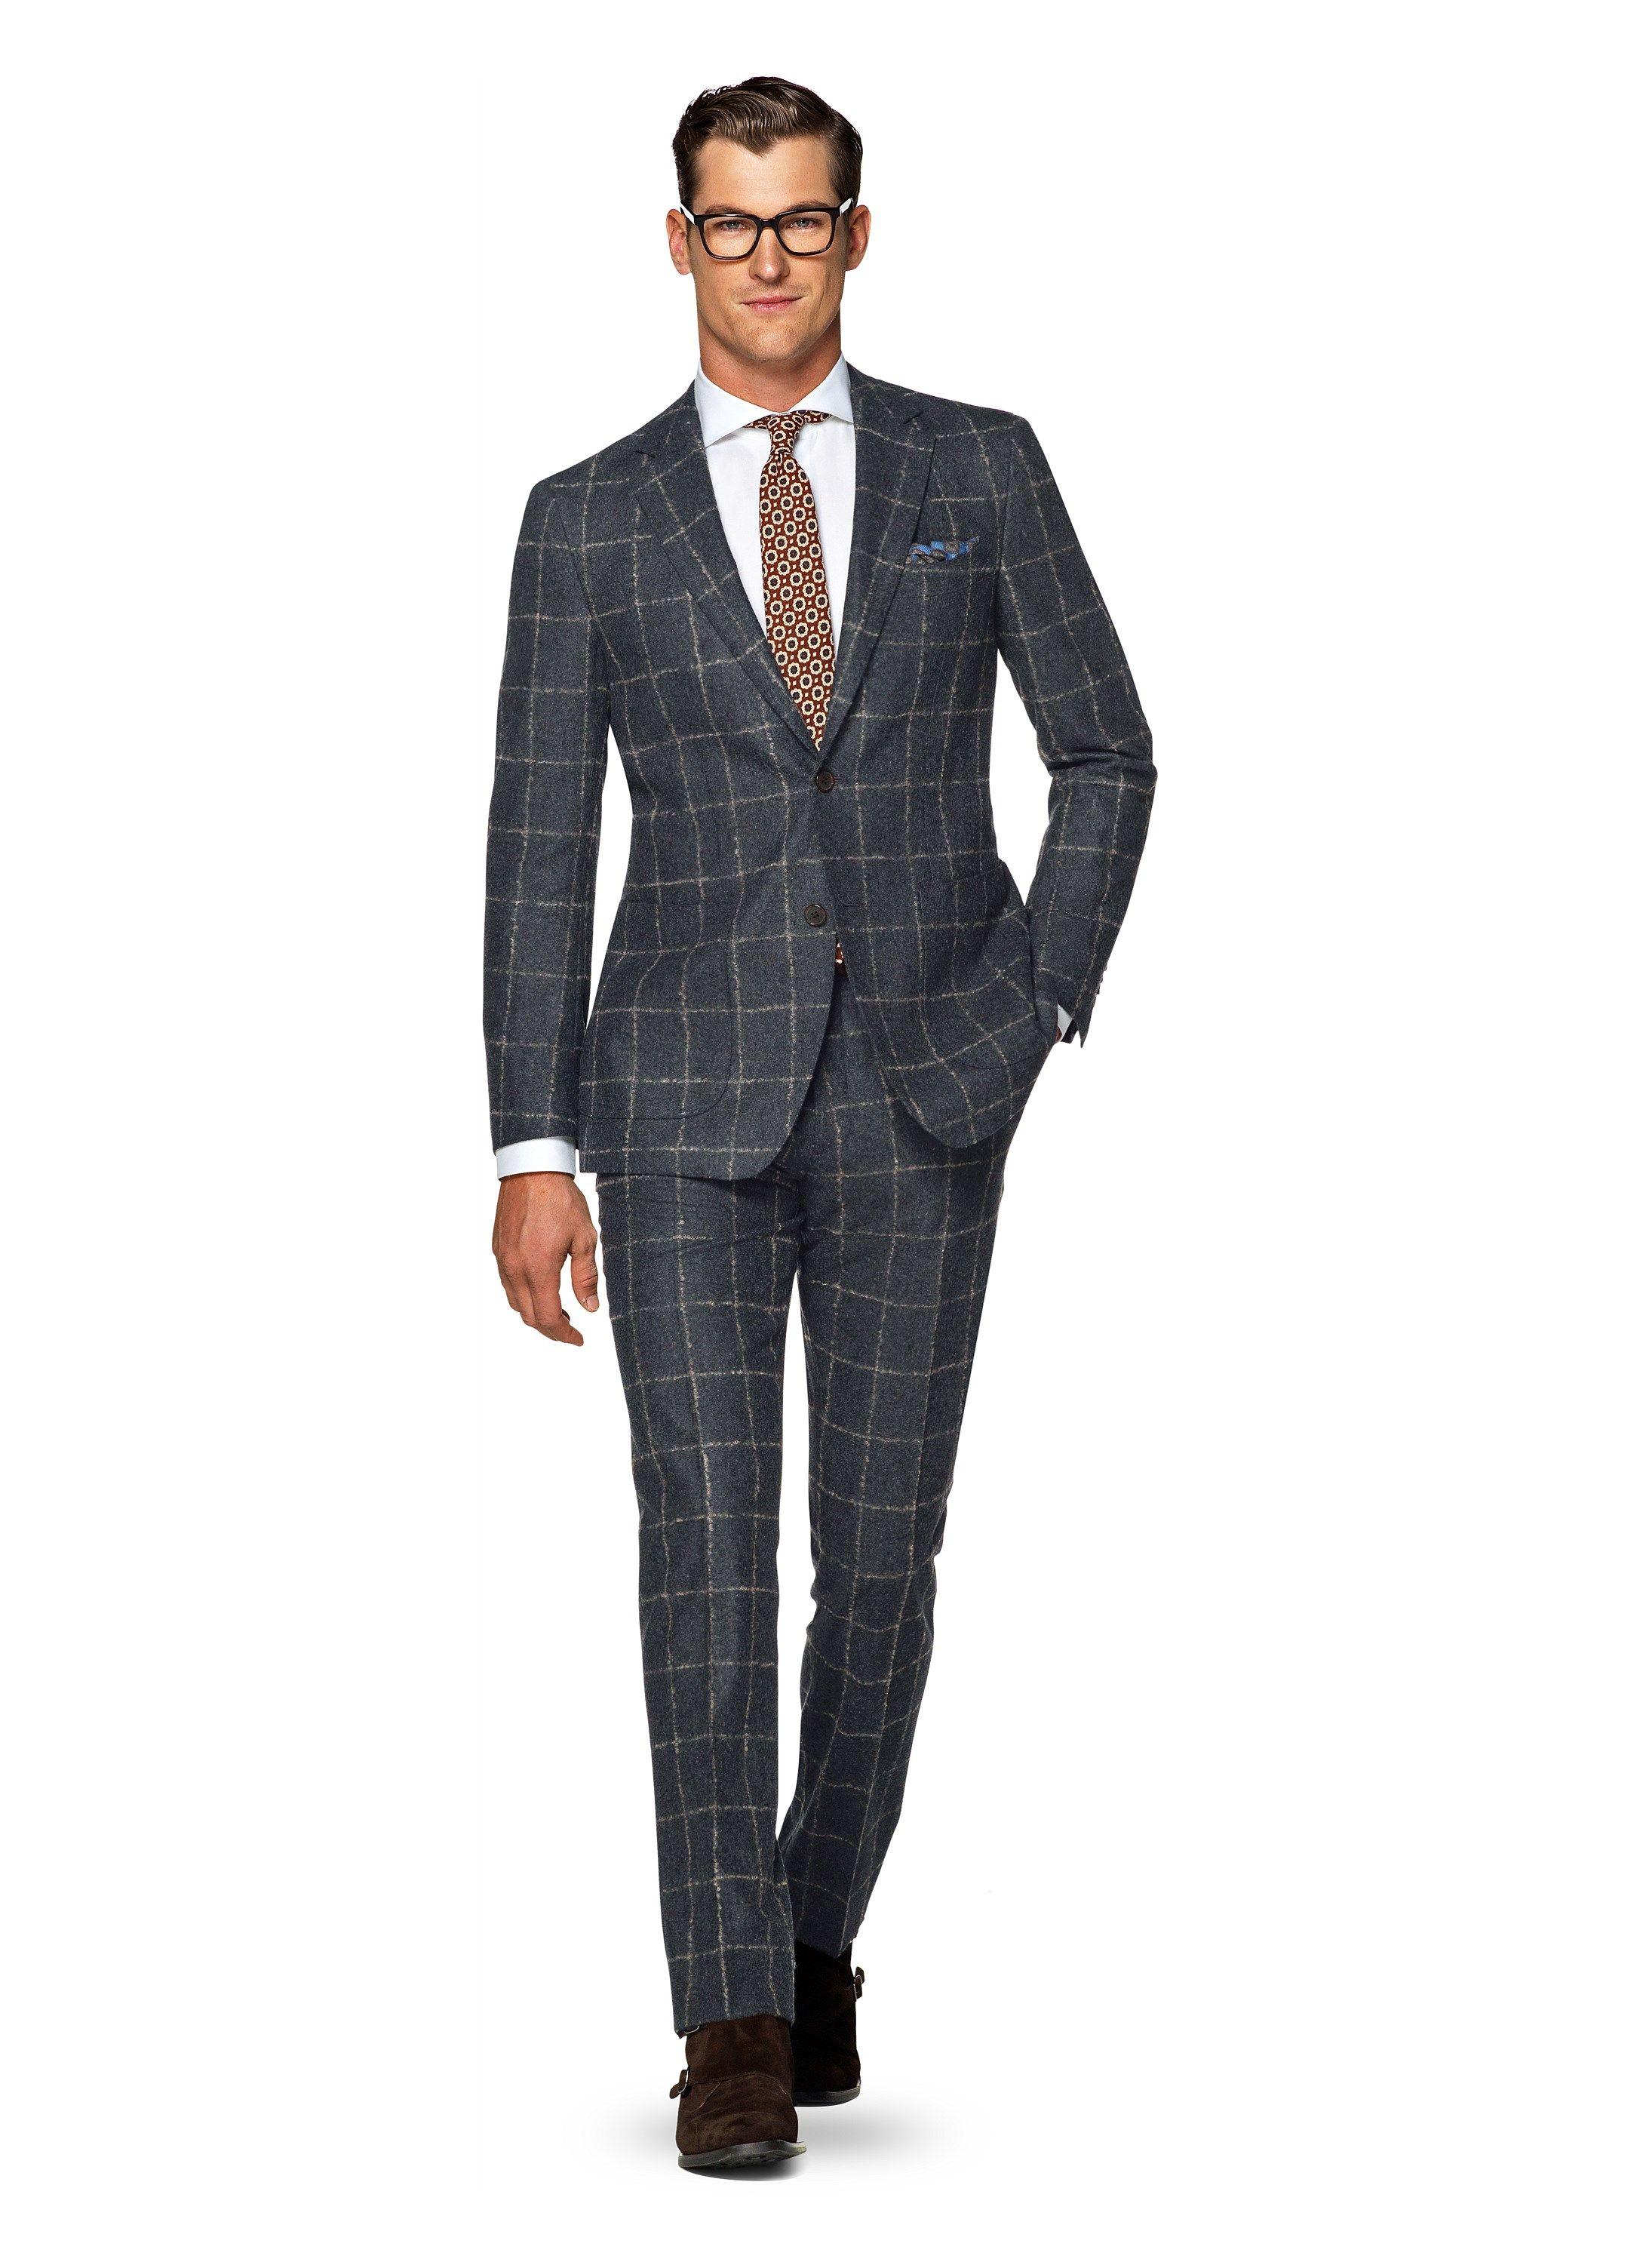 Wonderbaar Suit Grey Check Havana P4959i   Suitsupply Online Store   Dress KU-08